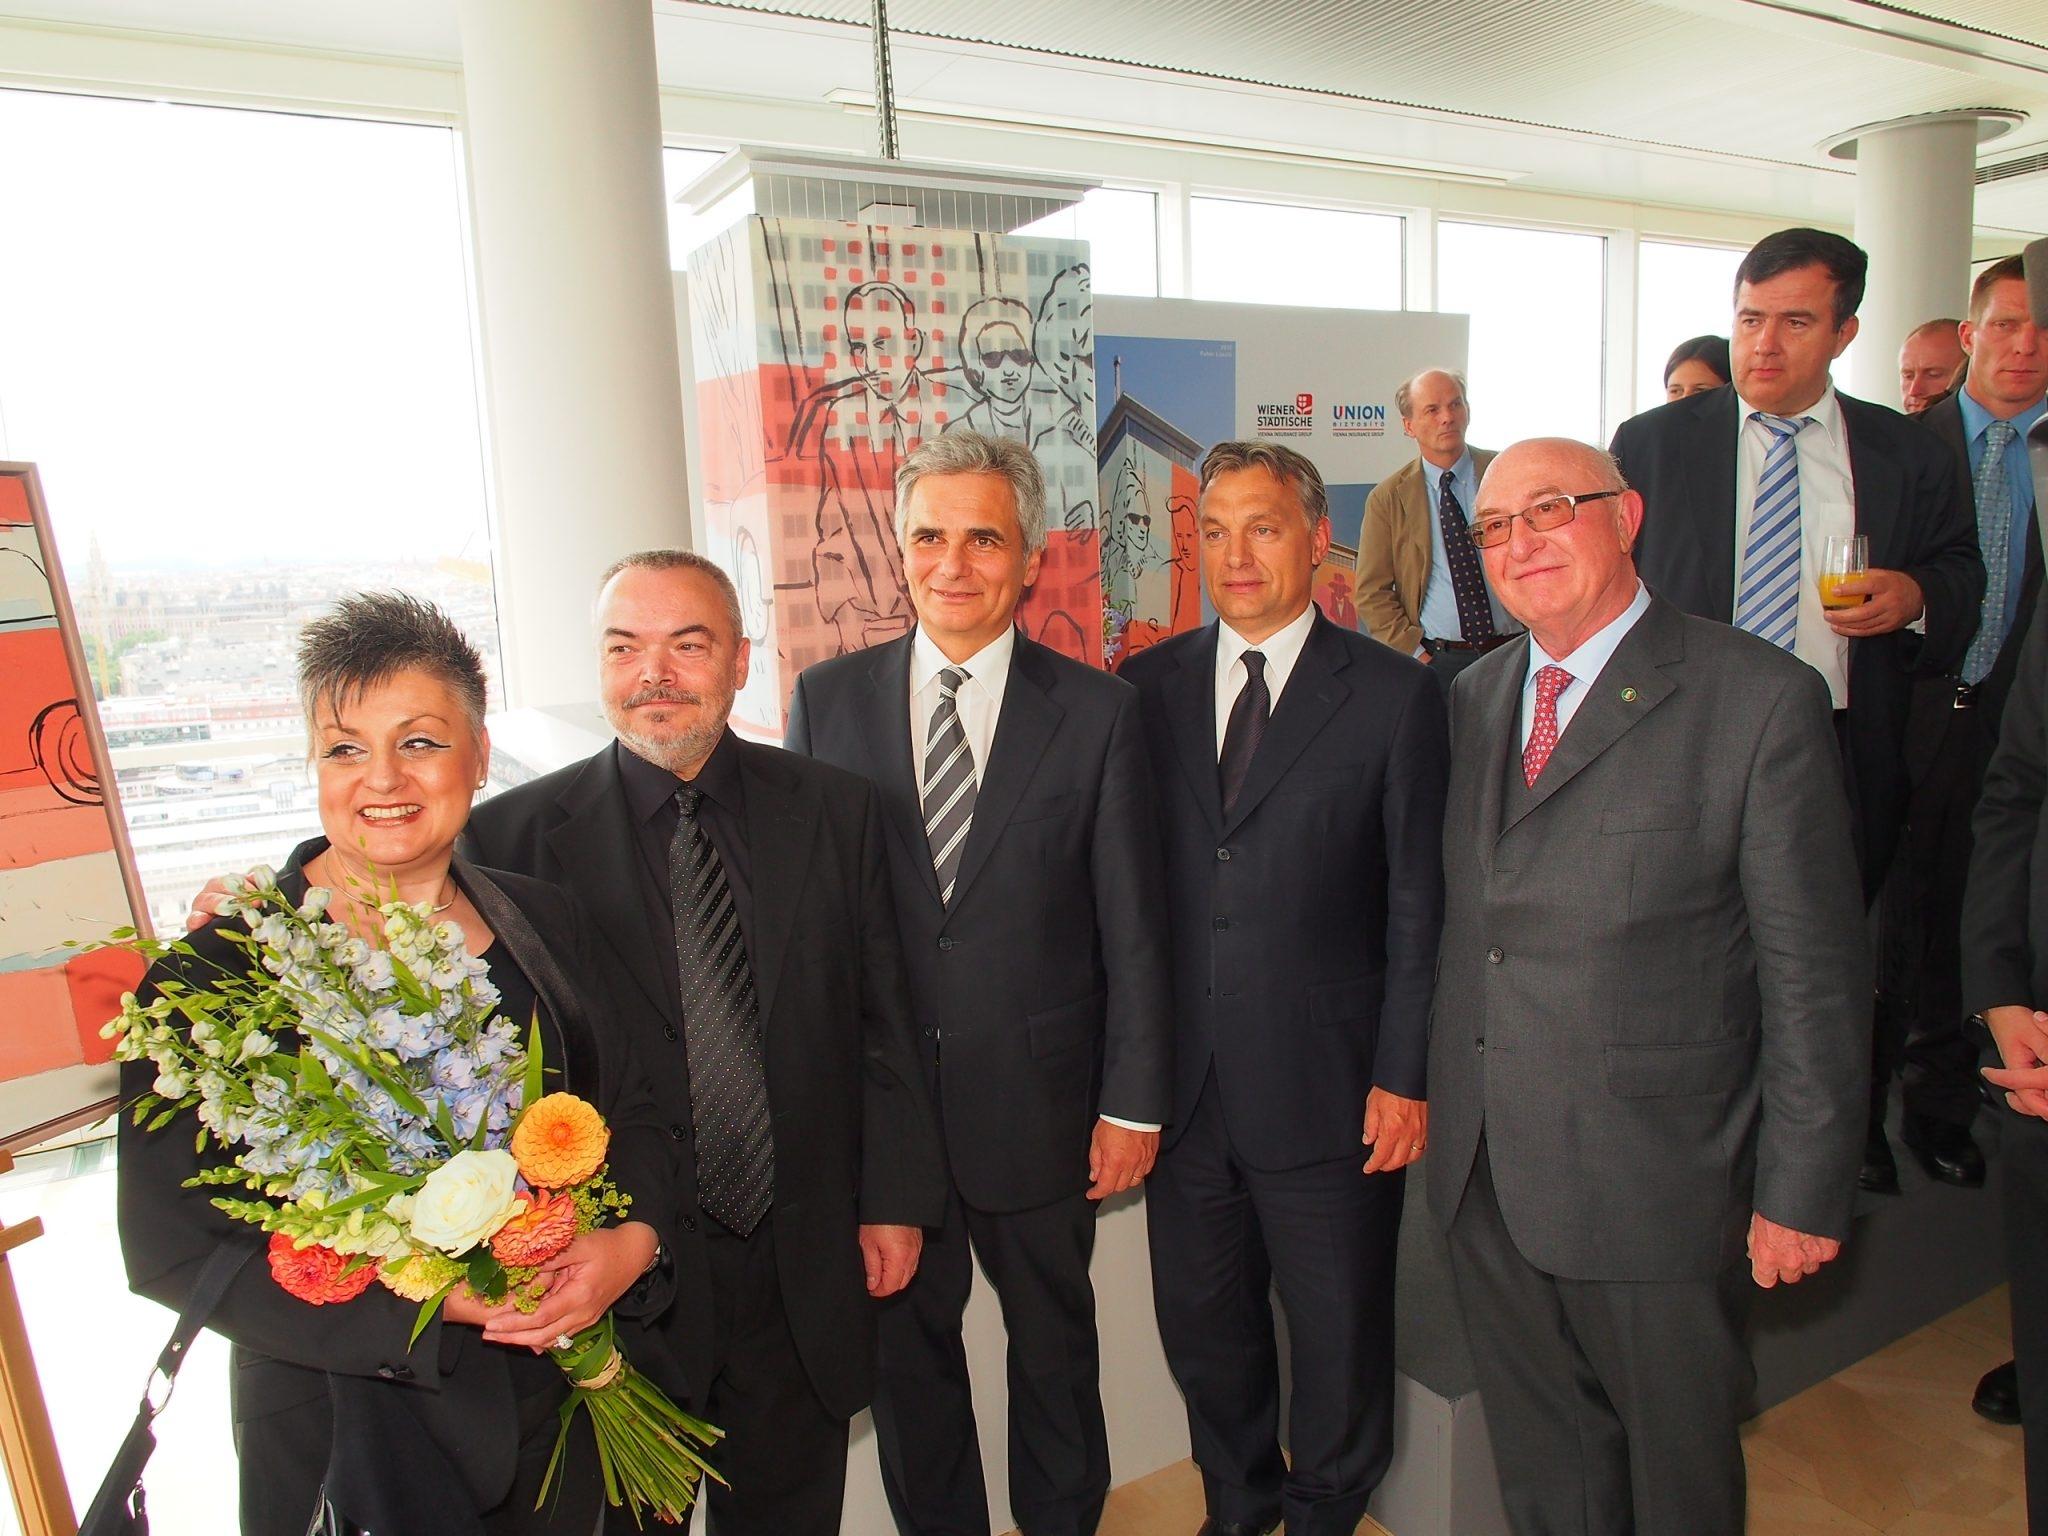 On the picture from left to right: Edit Fehér, artist László Fehér, Federal Chancellor Werner Faymann, Hungarian Prime Minister Viktor Orbán and Wiener Städtische CEO Günter Geyer. © Zach-Kiesling